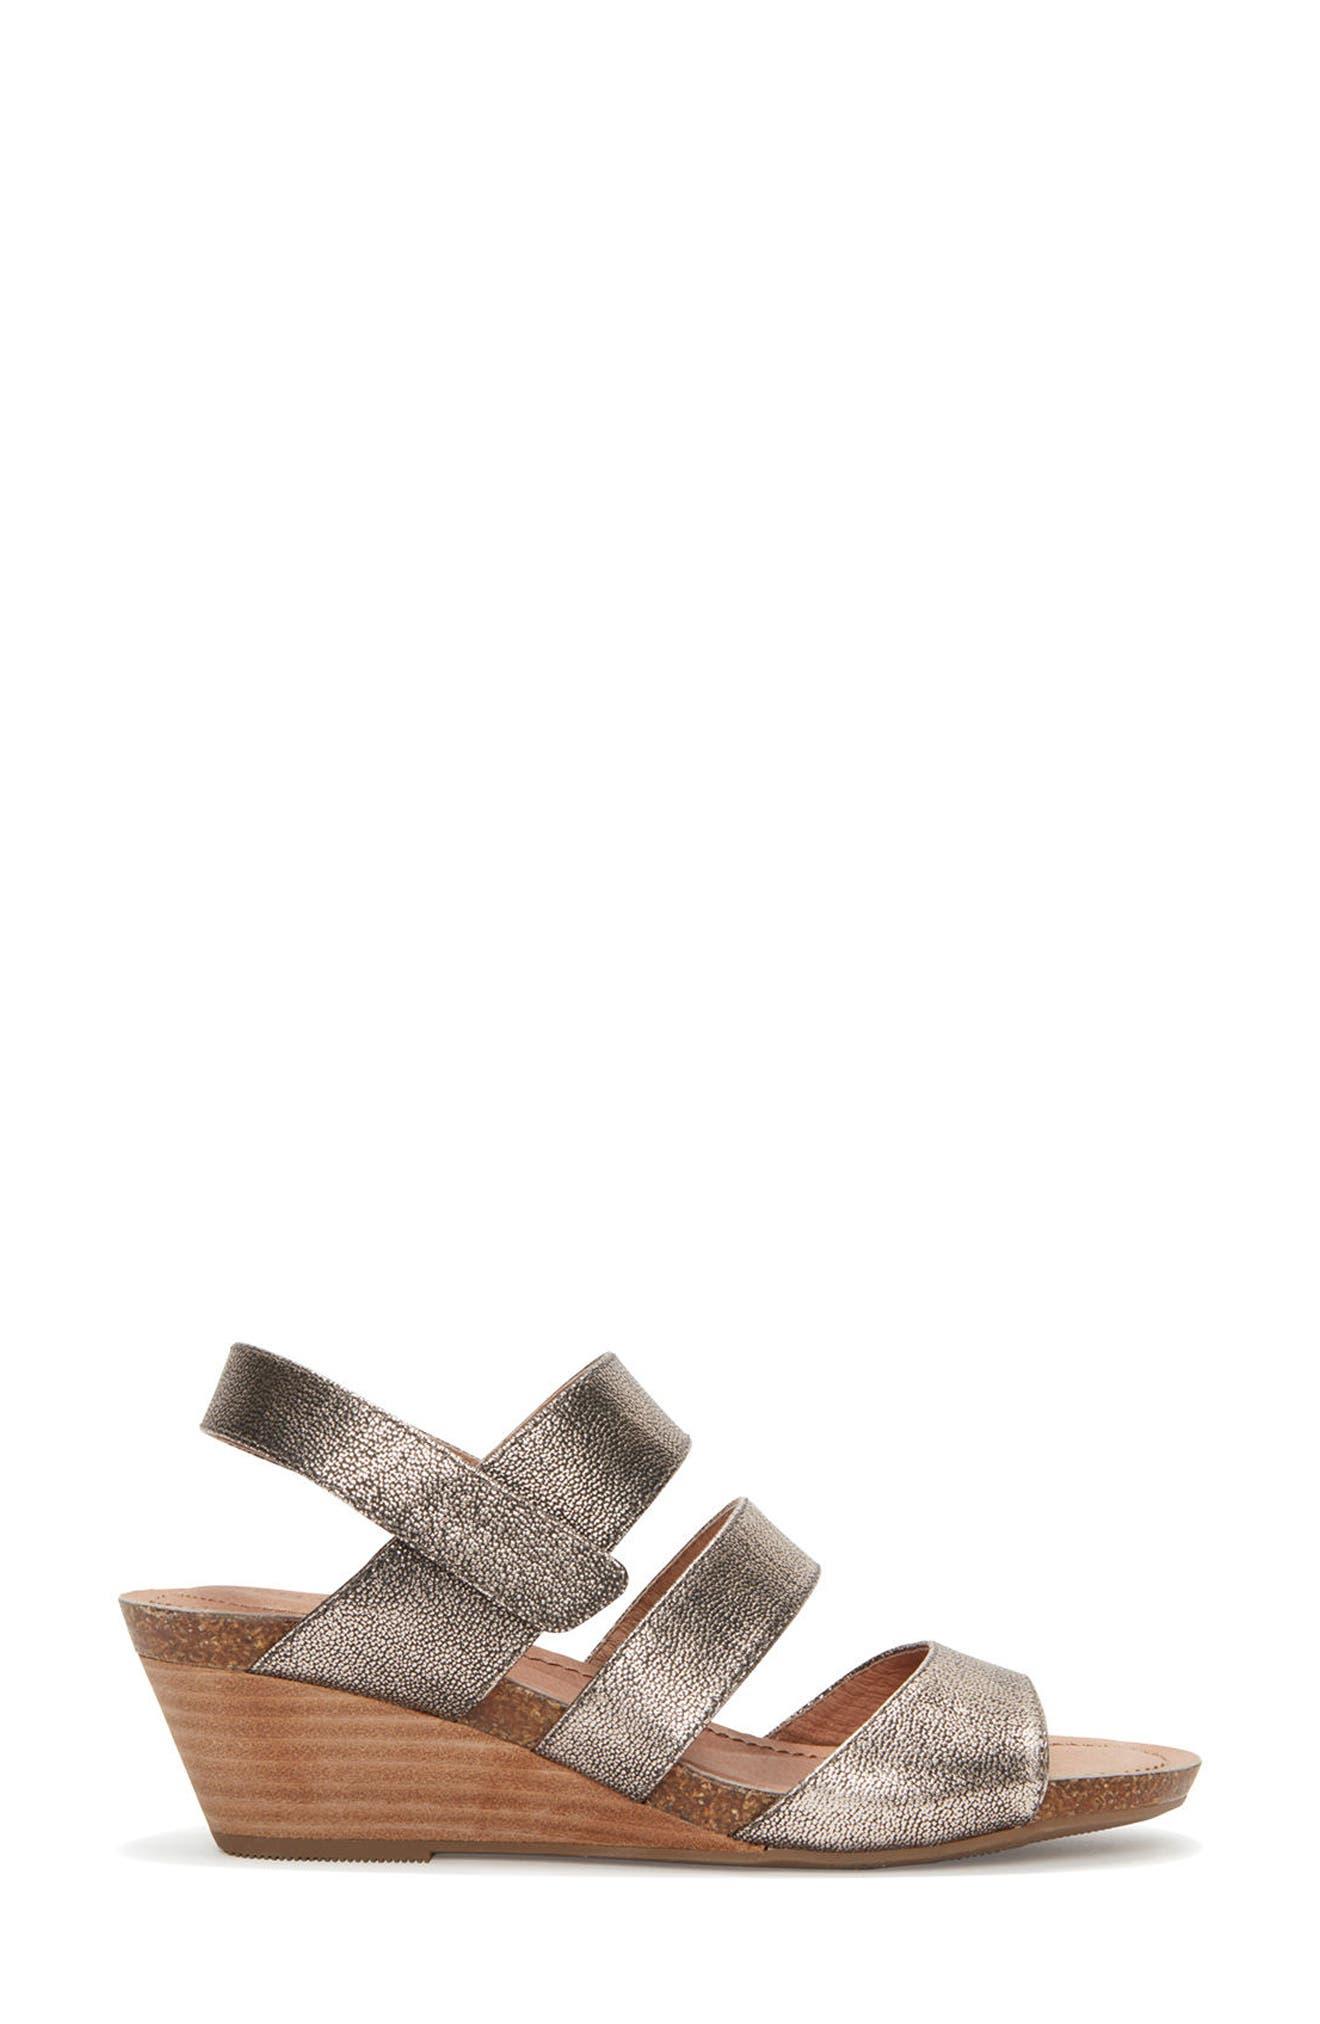 Adam Tucker Tora Wedge Sandal,                             Alternate thumbnail 3, color,                             Champagne Leather